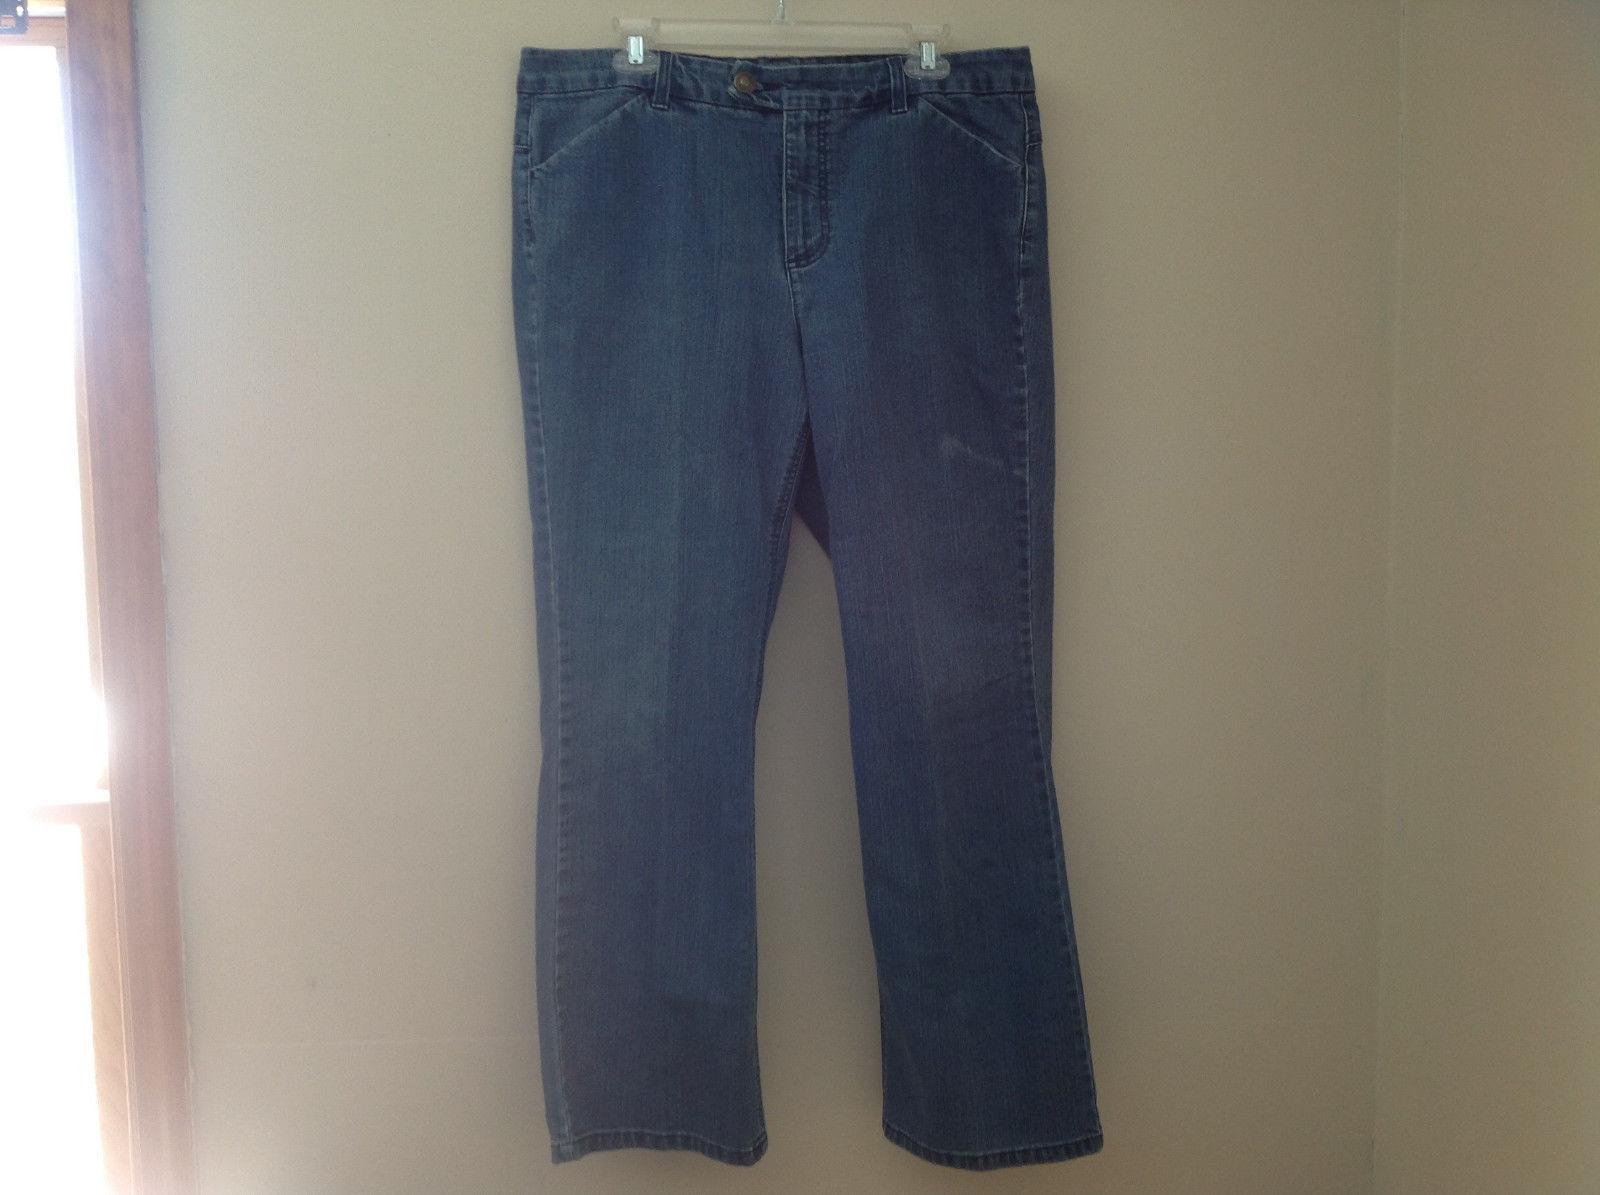 Charter Club Boot Cut Blue Jeans 4 Pockets Zipper 2 Button Closure Size 16W